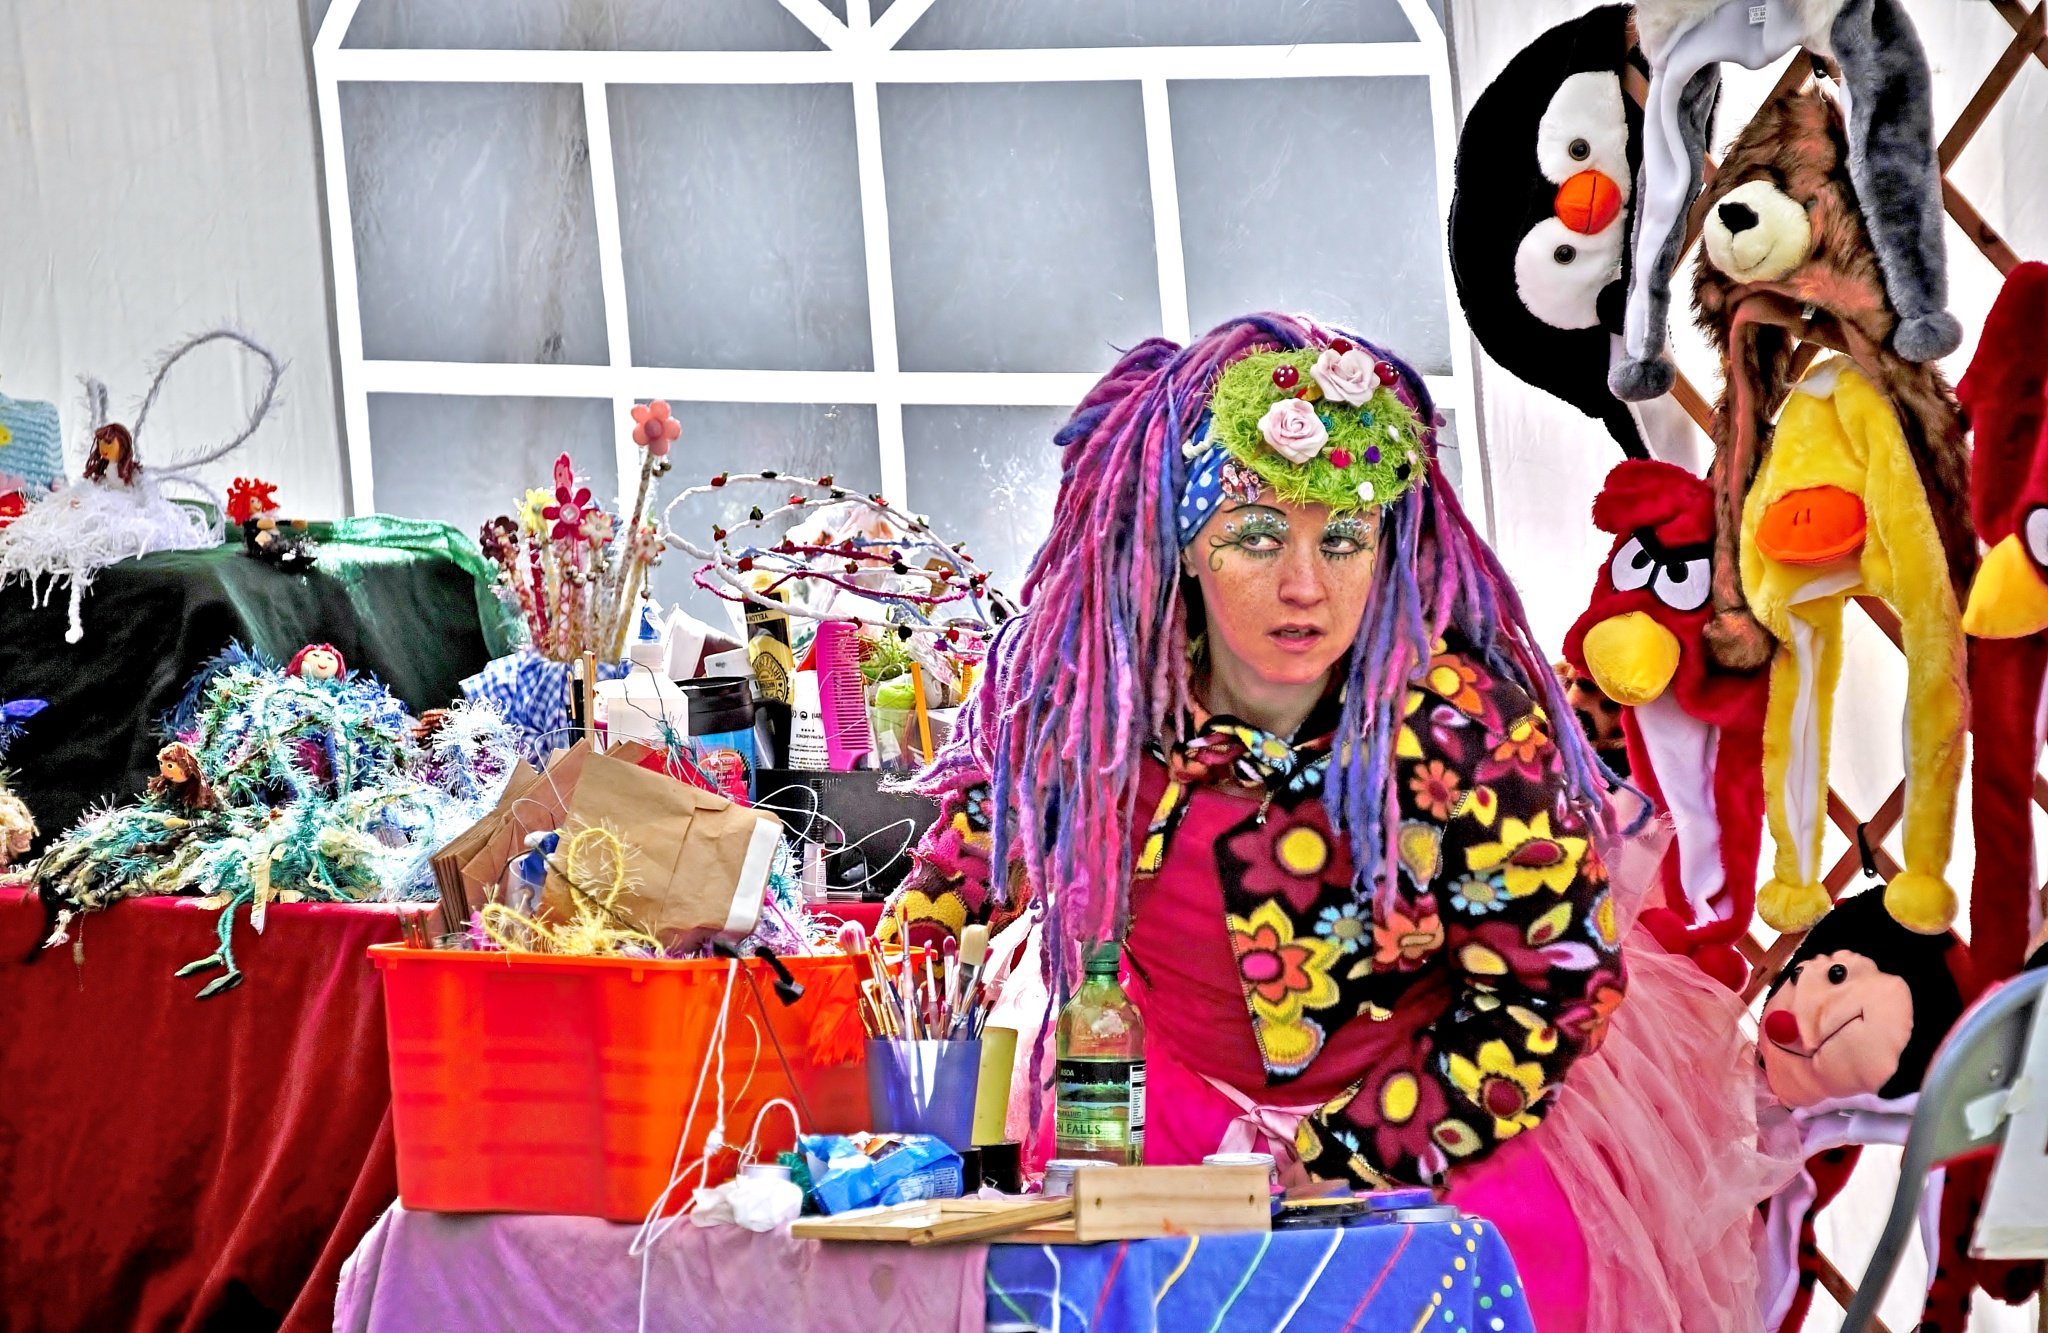 Fairy & Dream Seller - Shrewsbury Folk Festival - Colour by paul.hosker